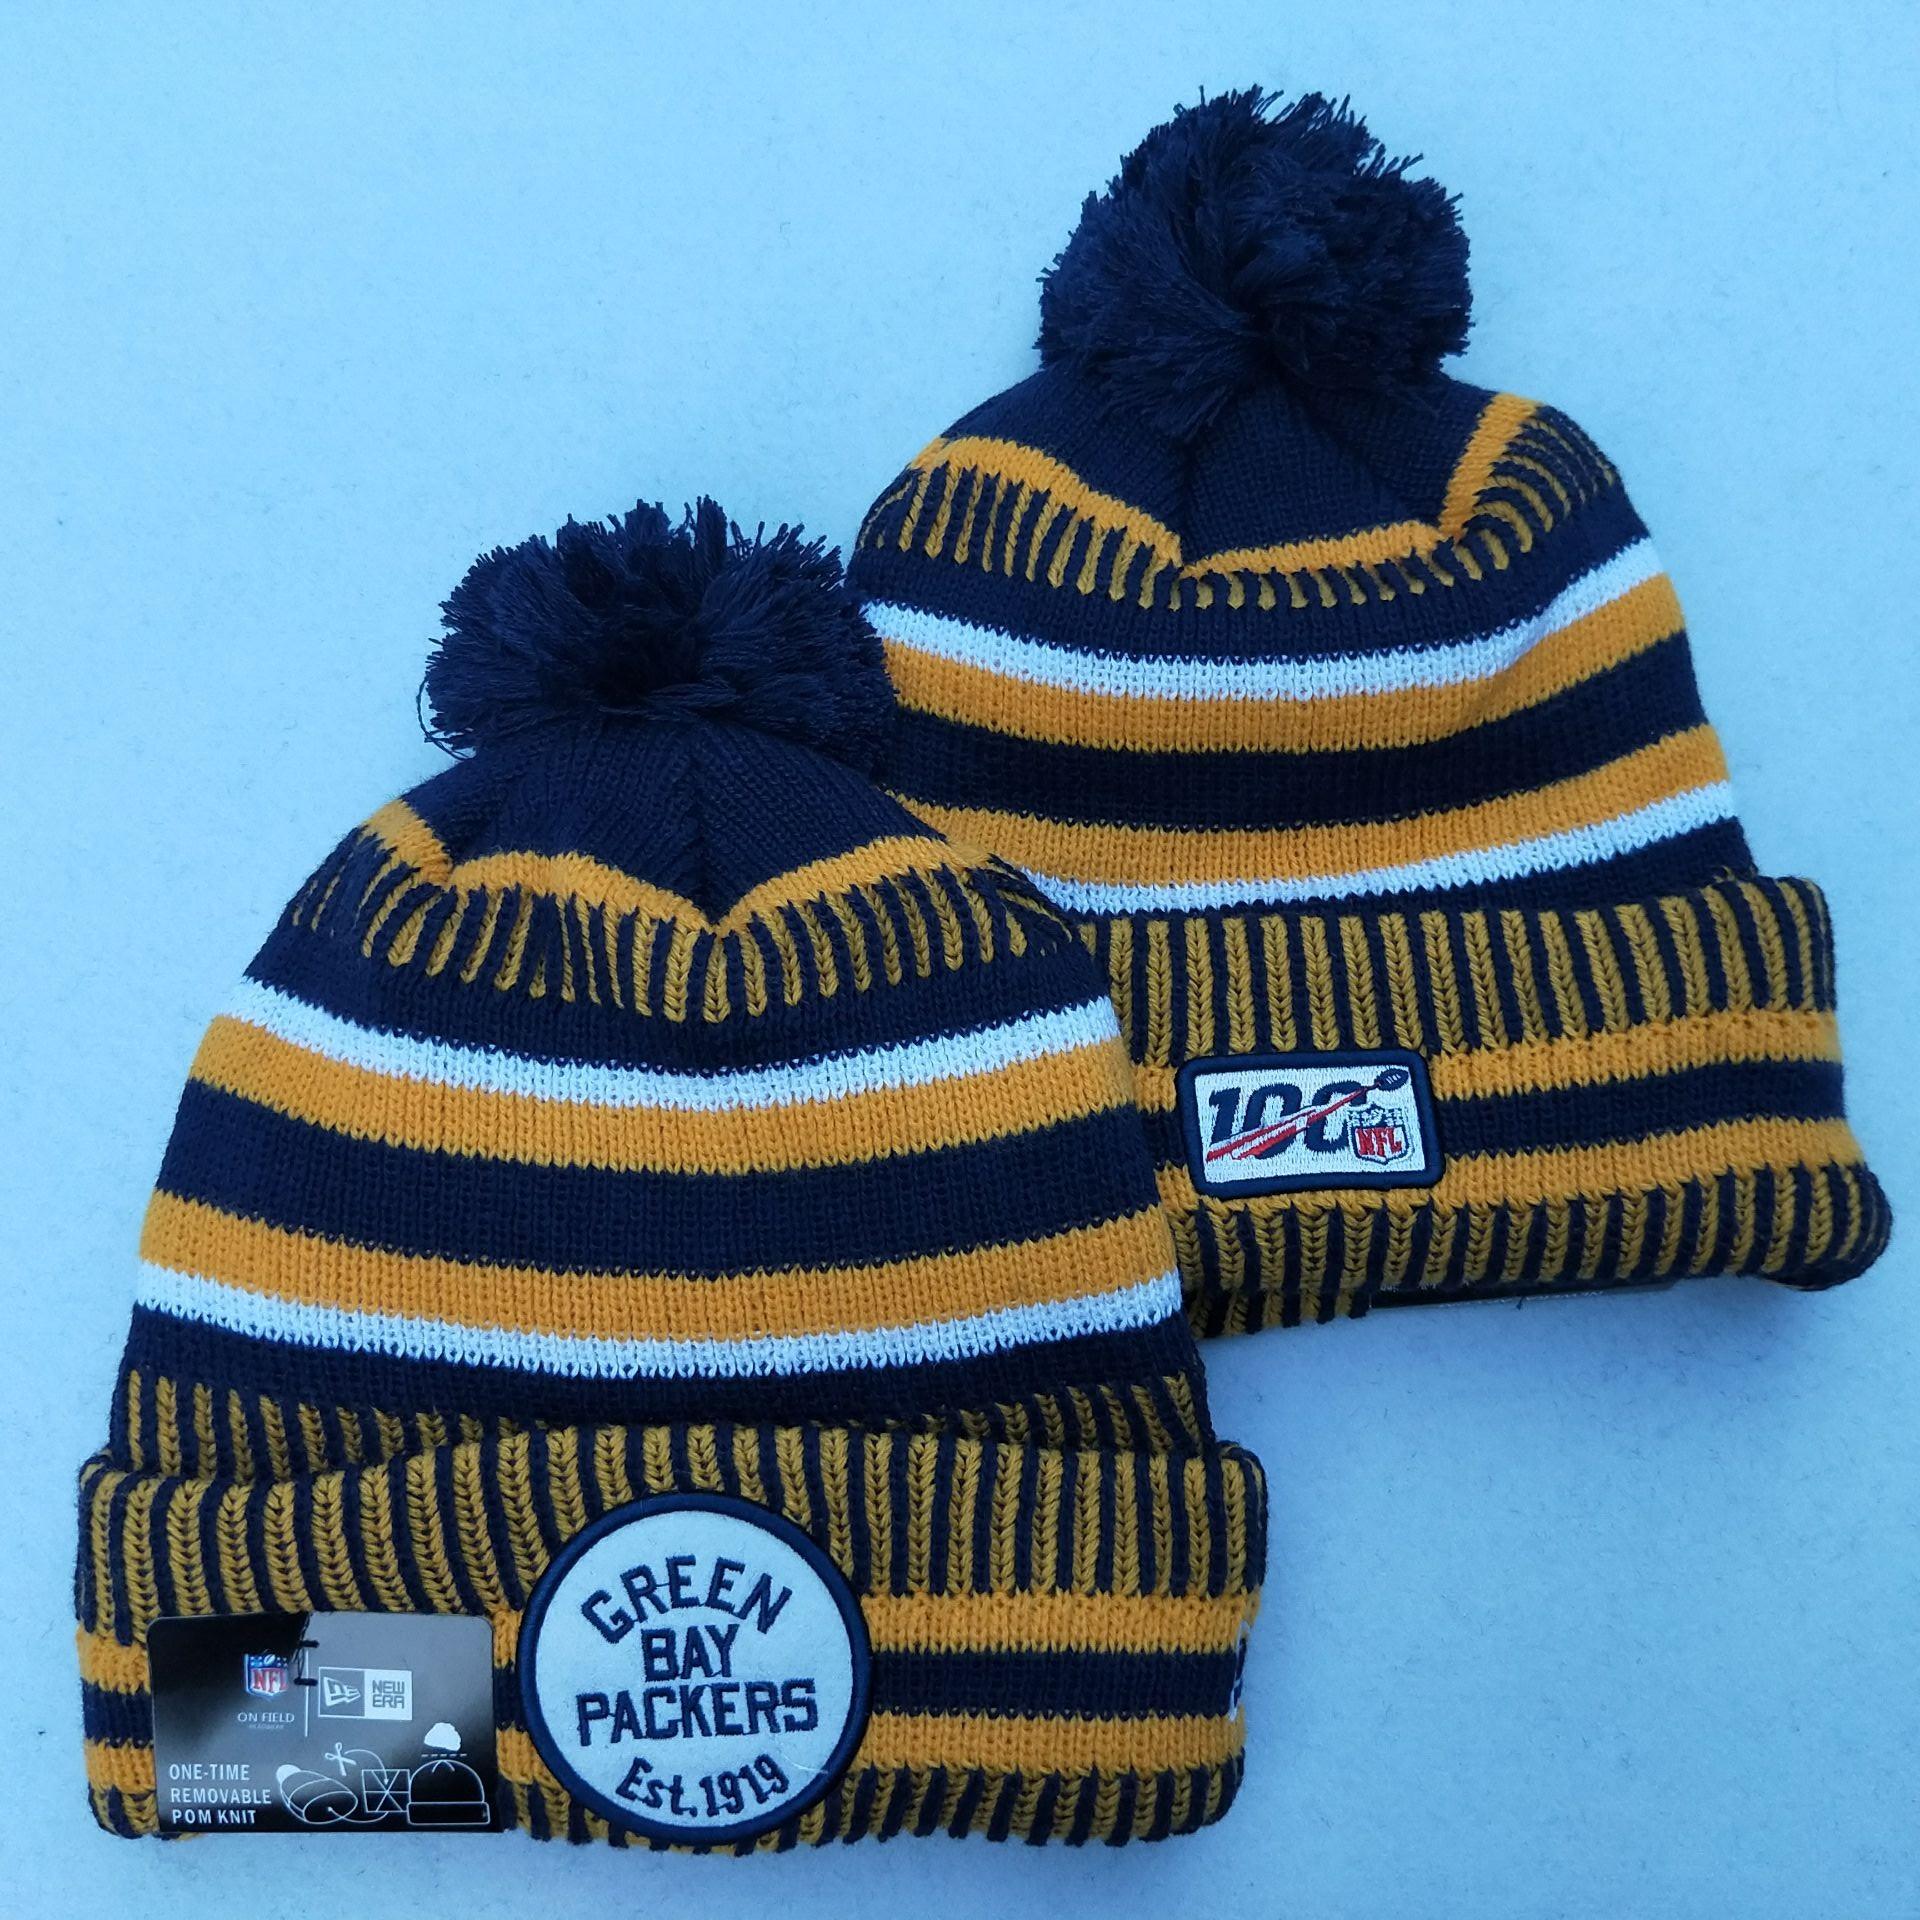 Packers Team Logo Yellow 100th Season Pom Knit Hat YD